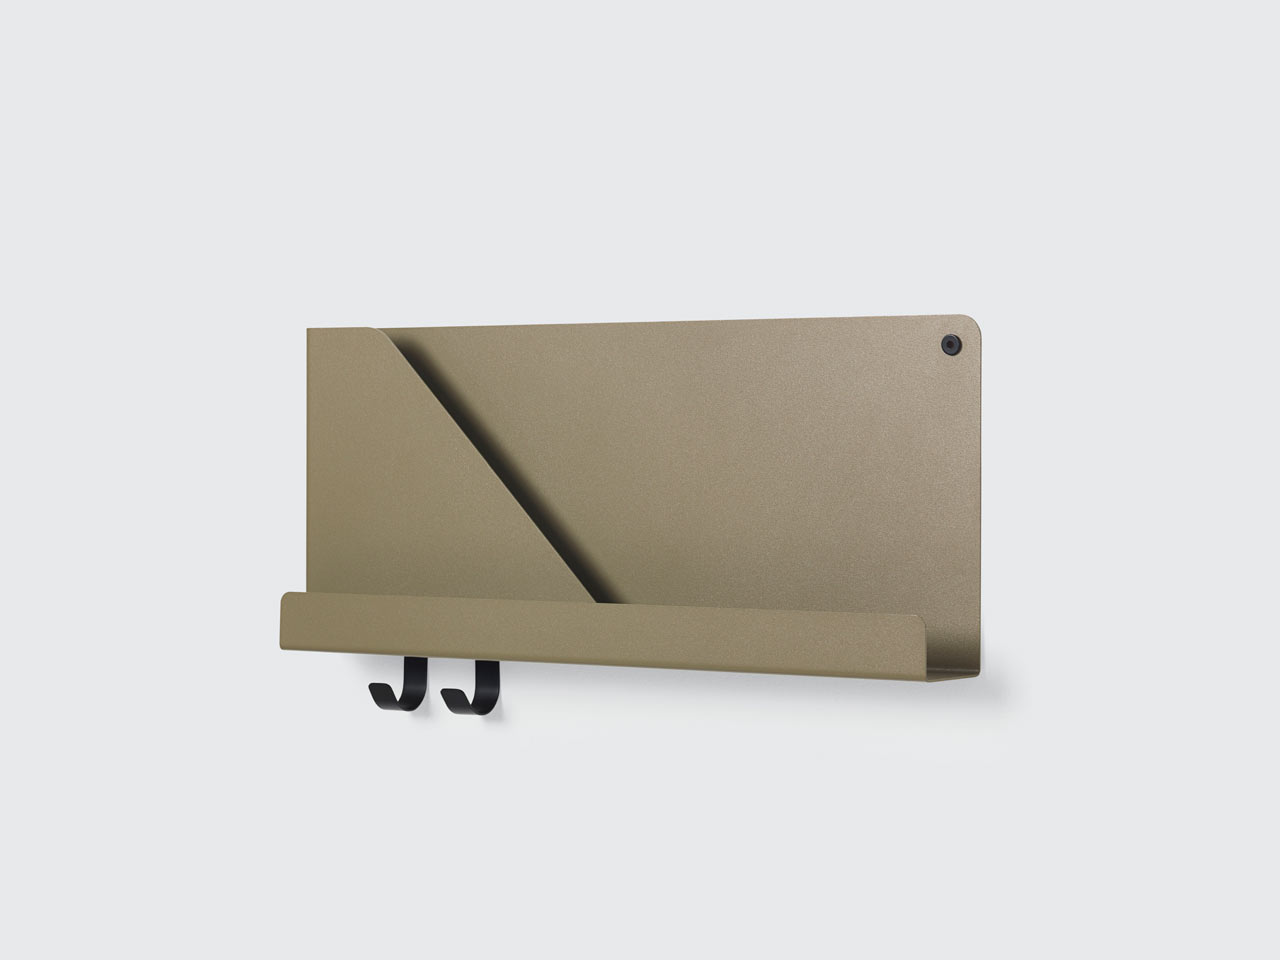 Folded-Shelf-Muuto-Johan-van-Hengel-16